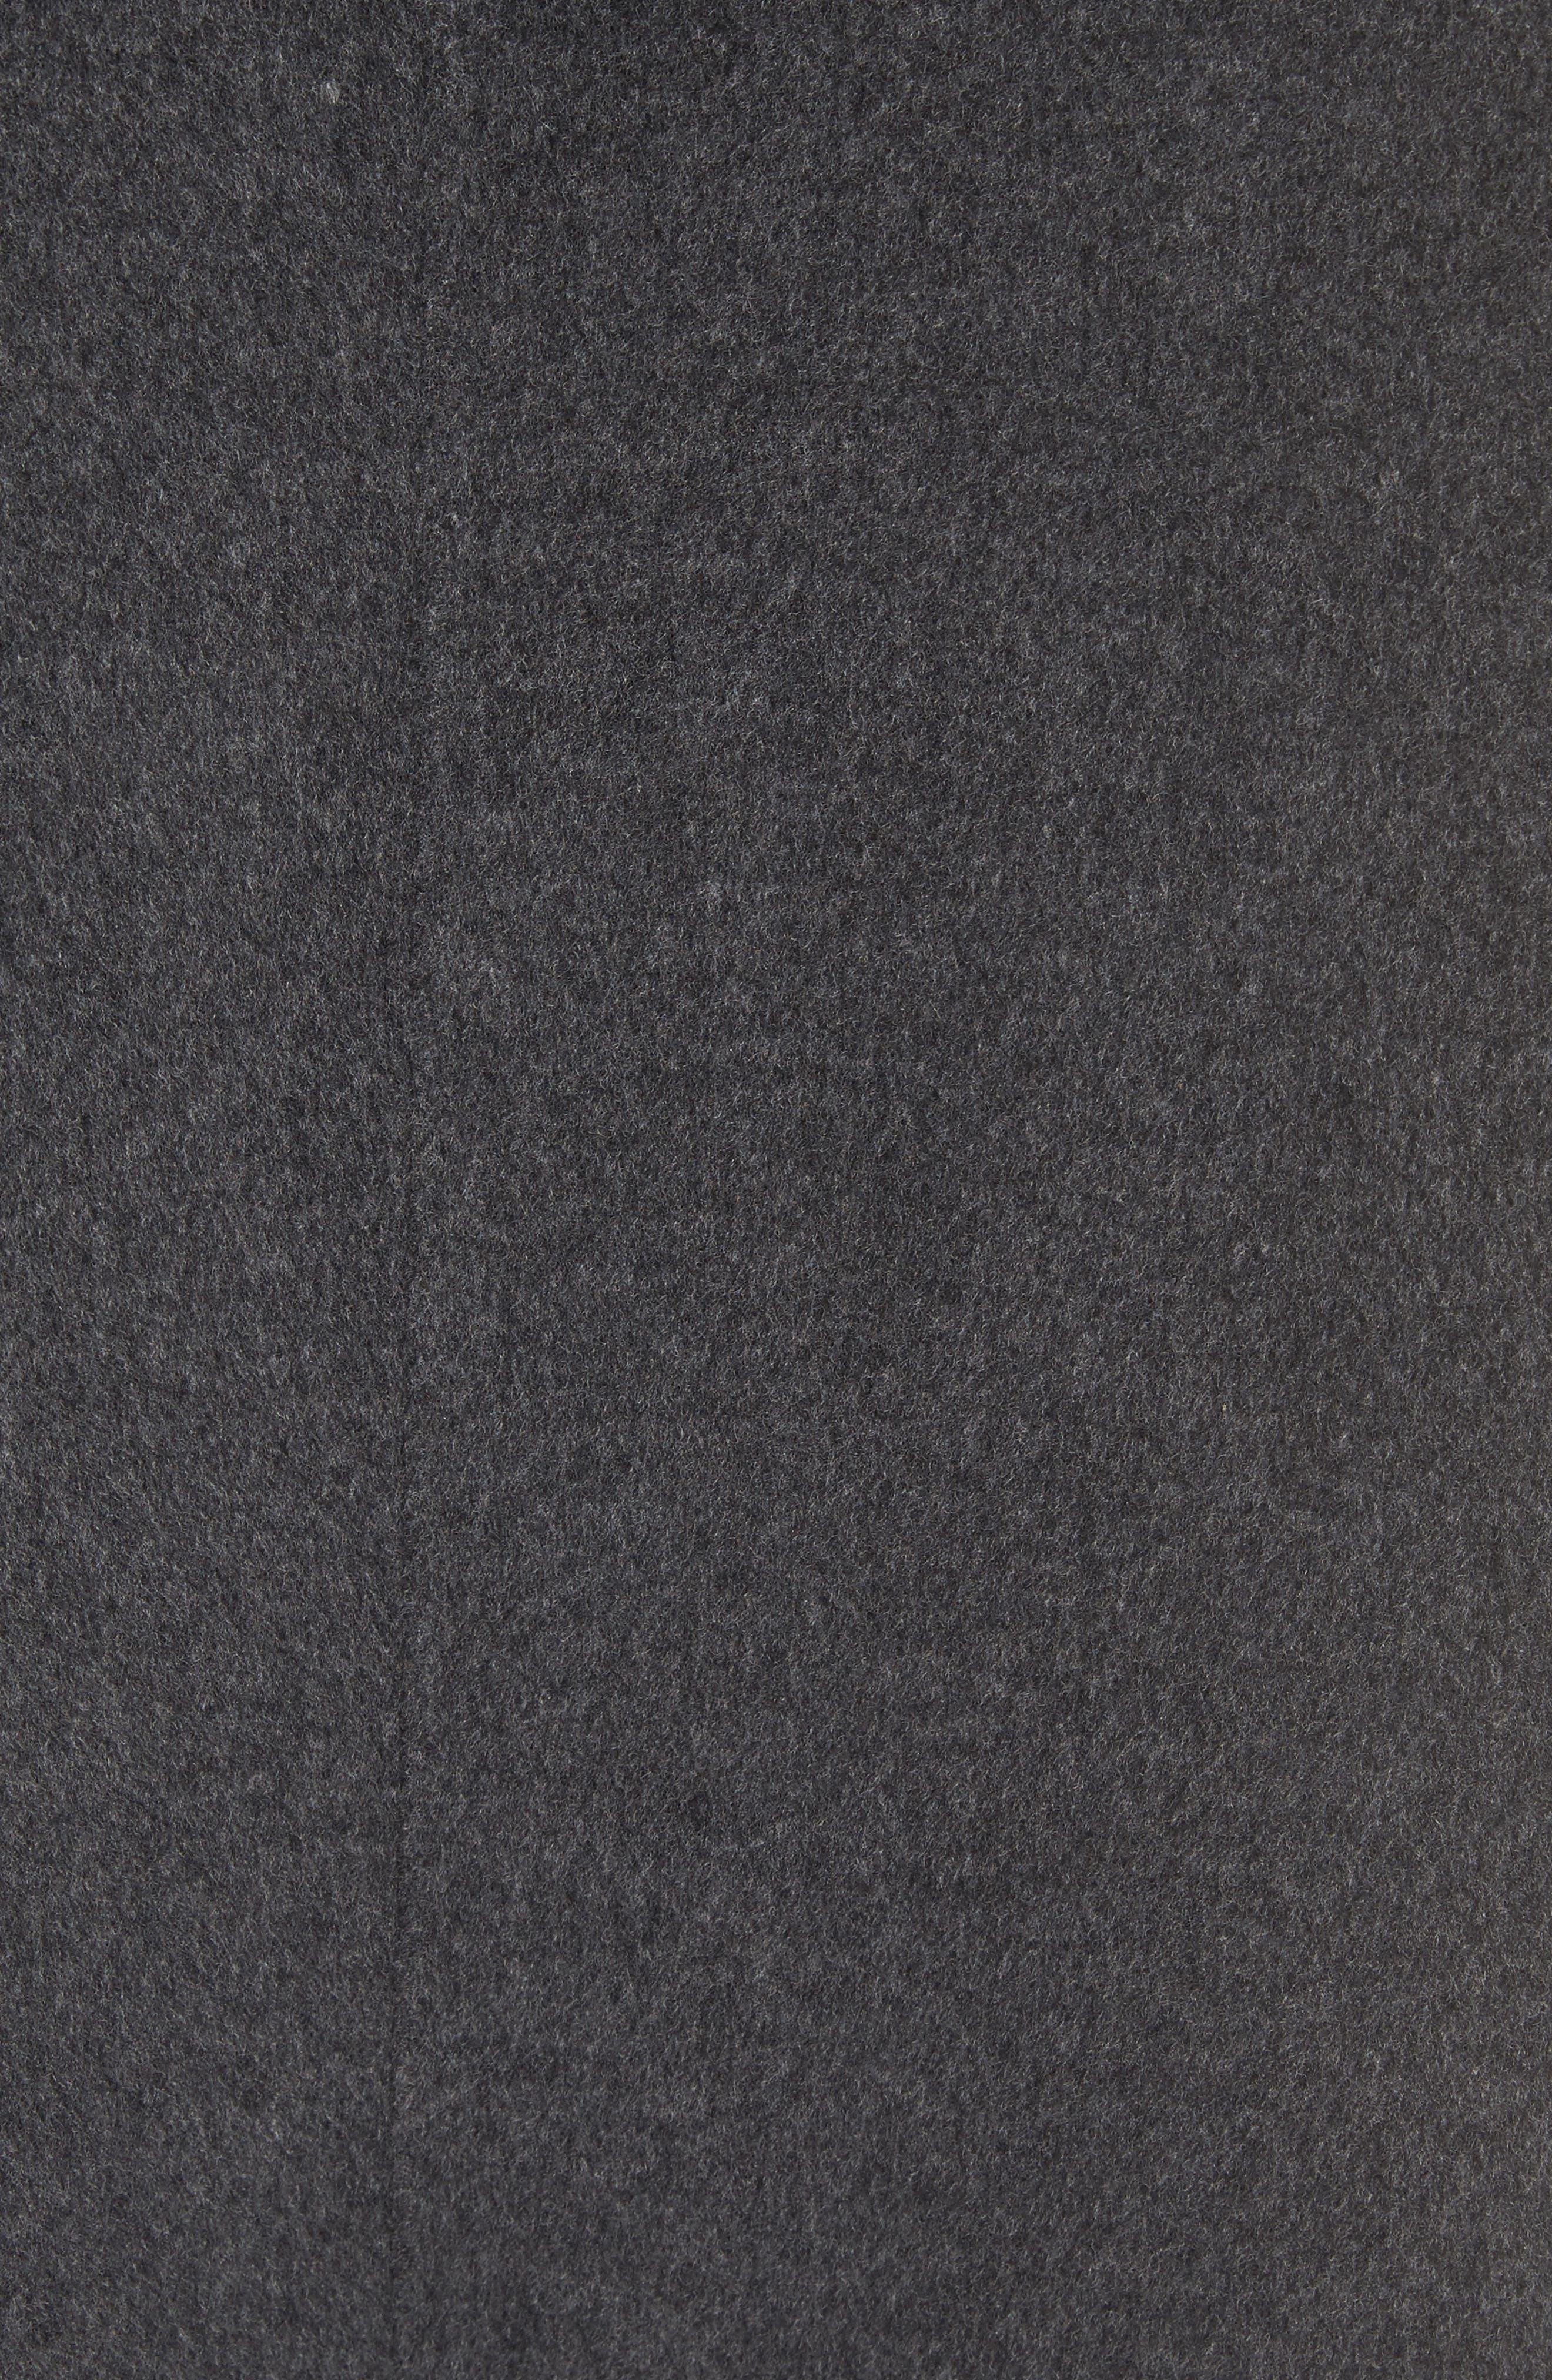 Double Face Wool & Cashmere Coat,                             Alternate thumbnail 6, color,                             060